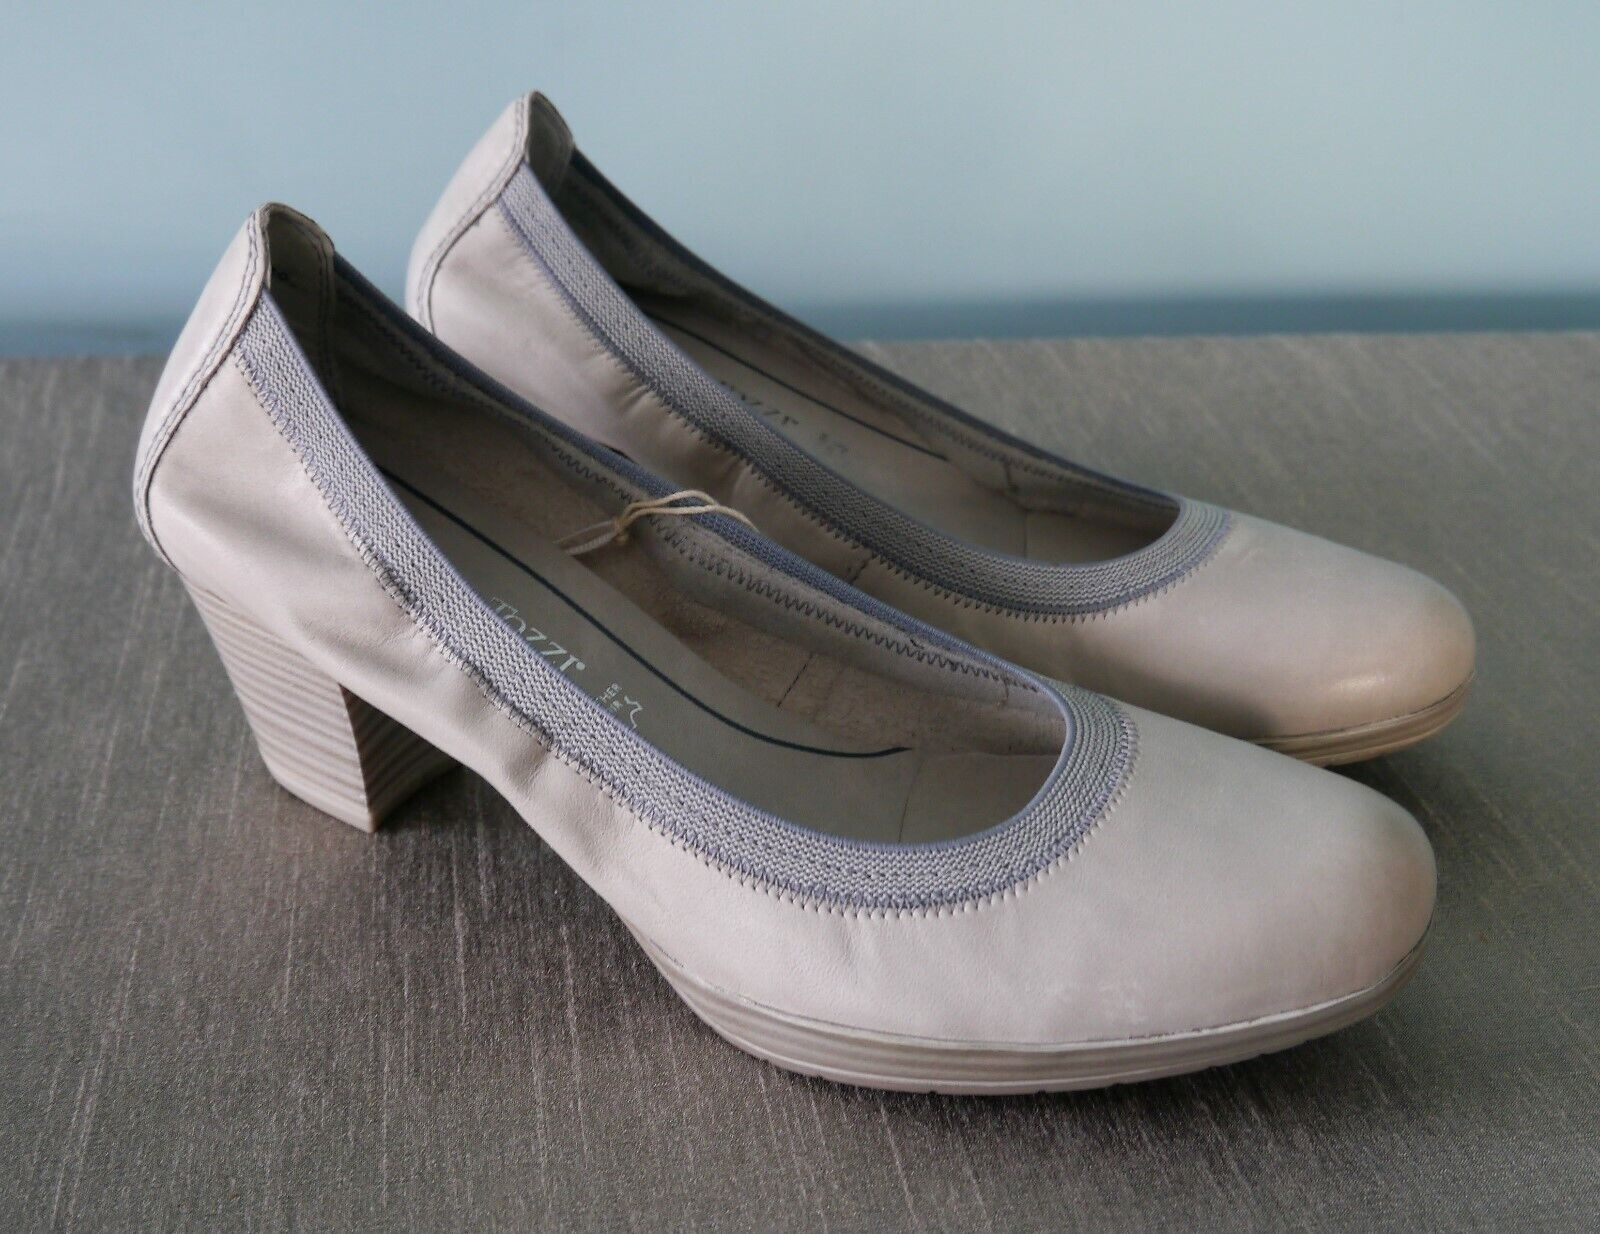 Marco Tozzi Quartz Antic Soft Soft Soft Leather Comfy Heels - Größe 6.5 (EU40) 416aa4